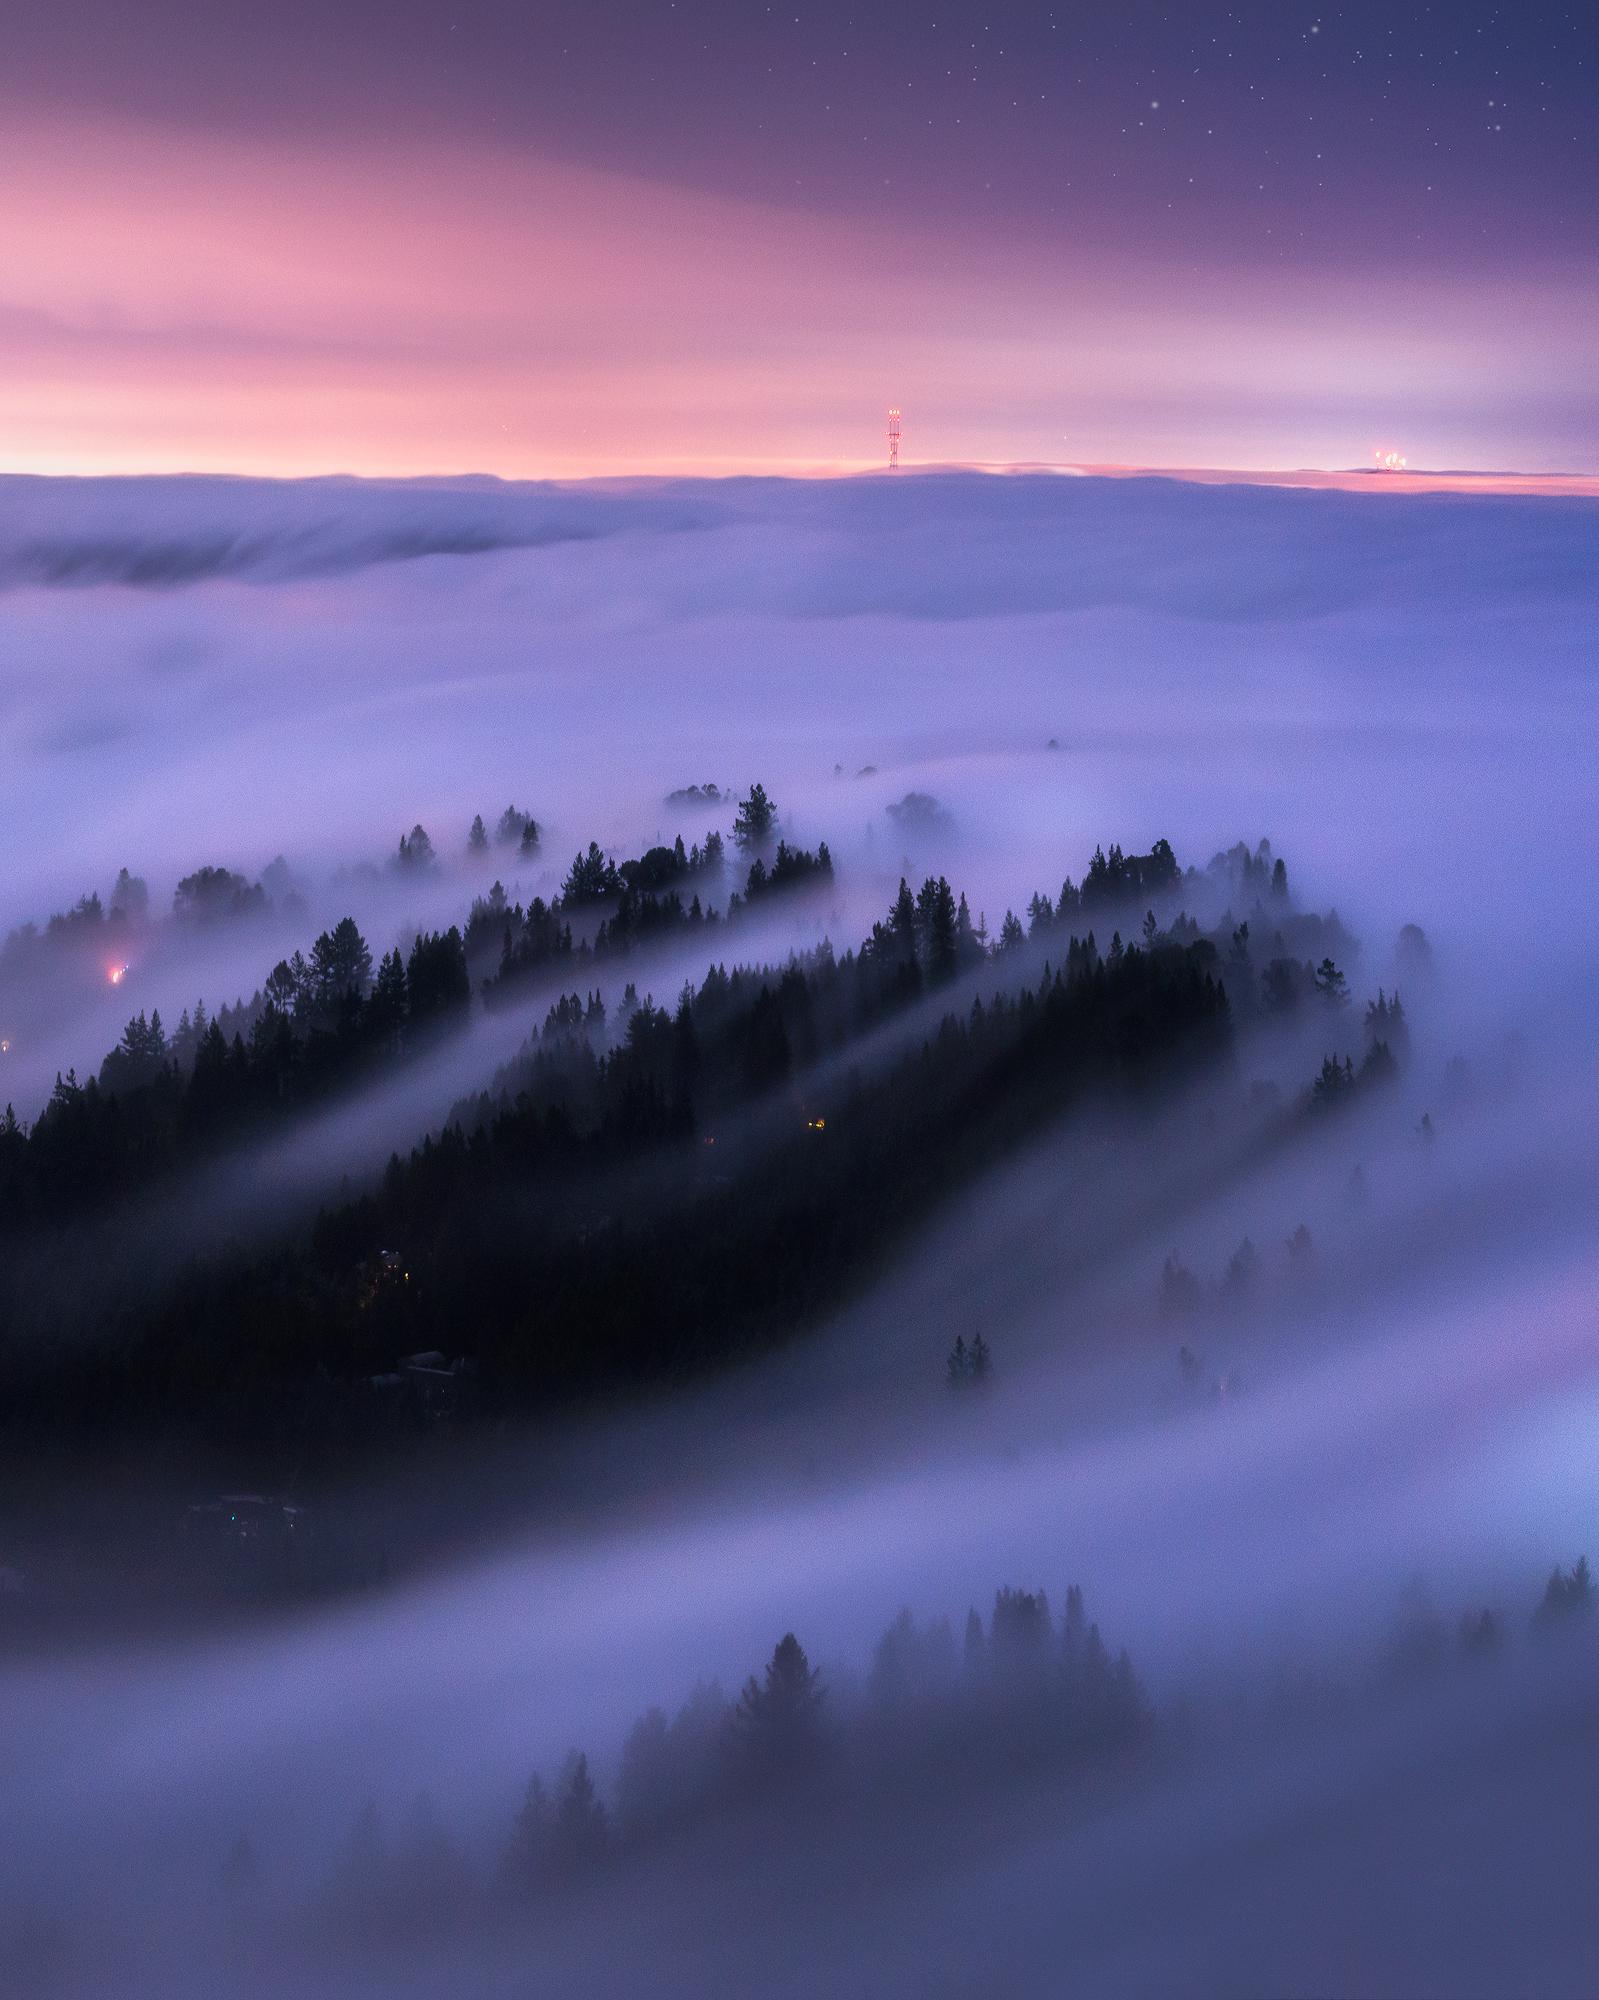 Moonlit Night Above the Fog- San Francisco, CA